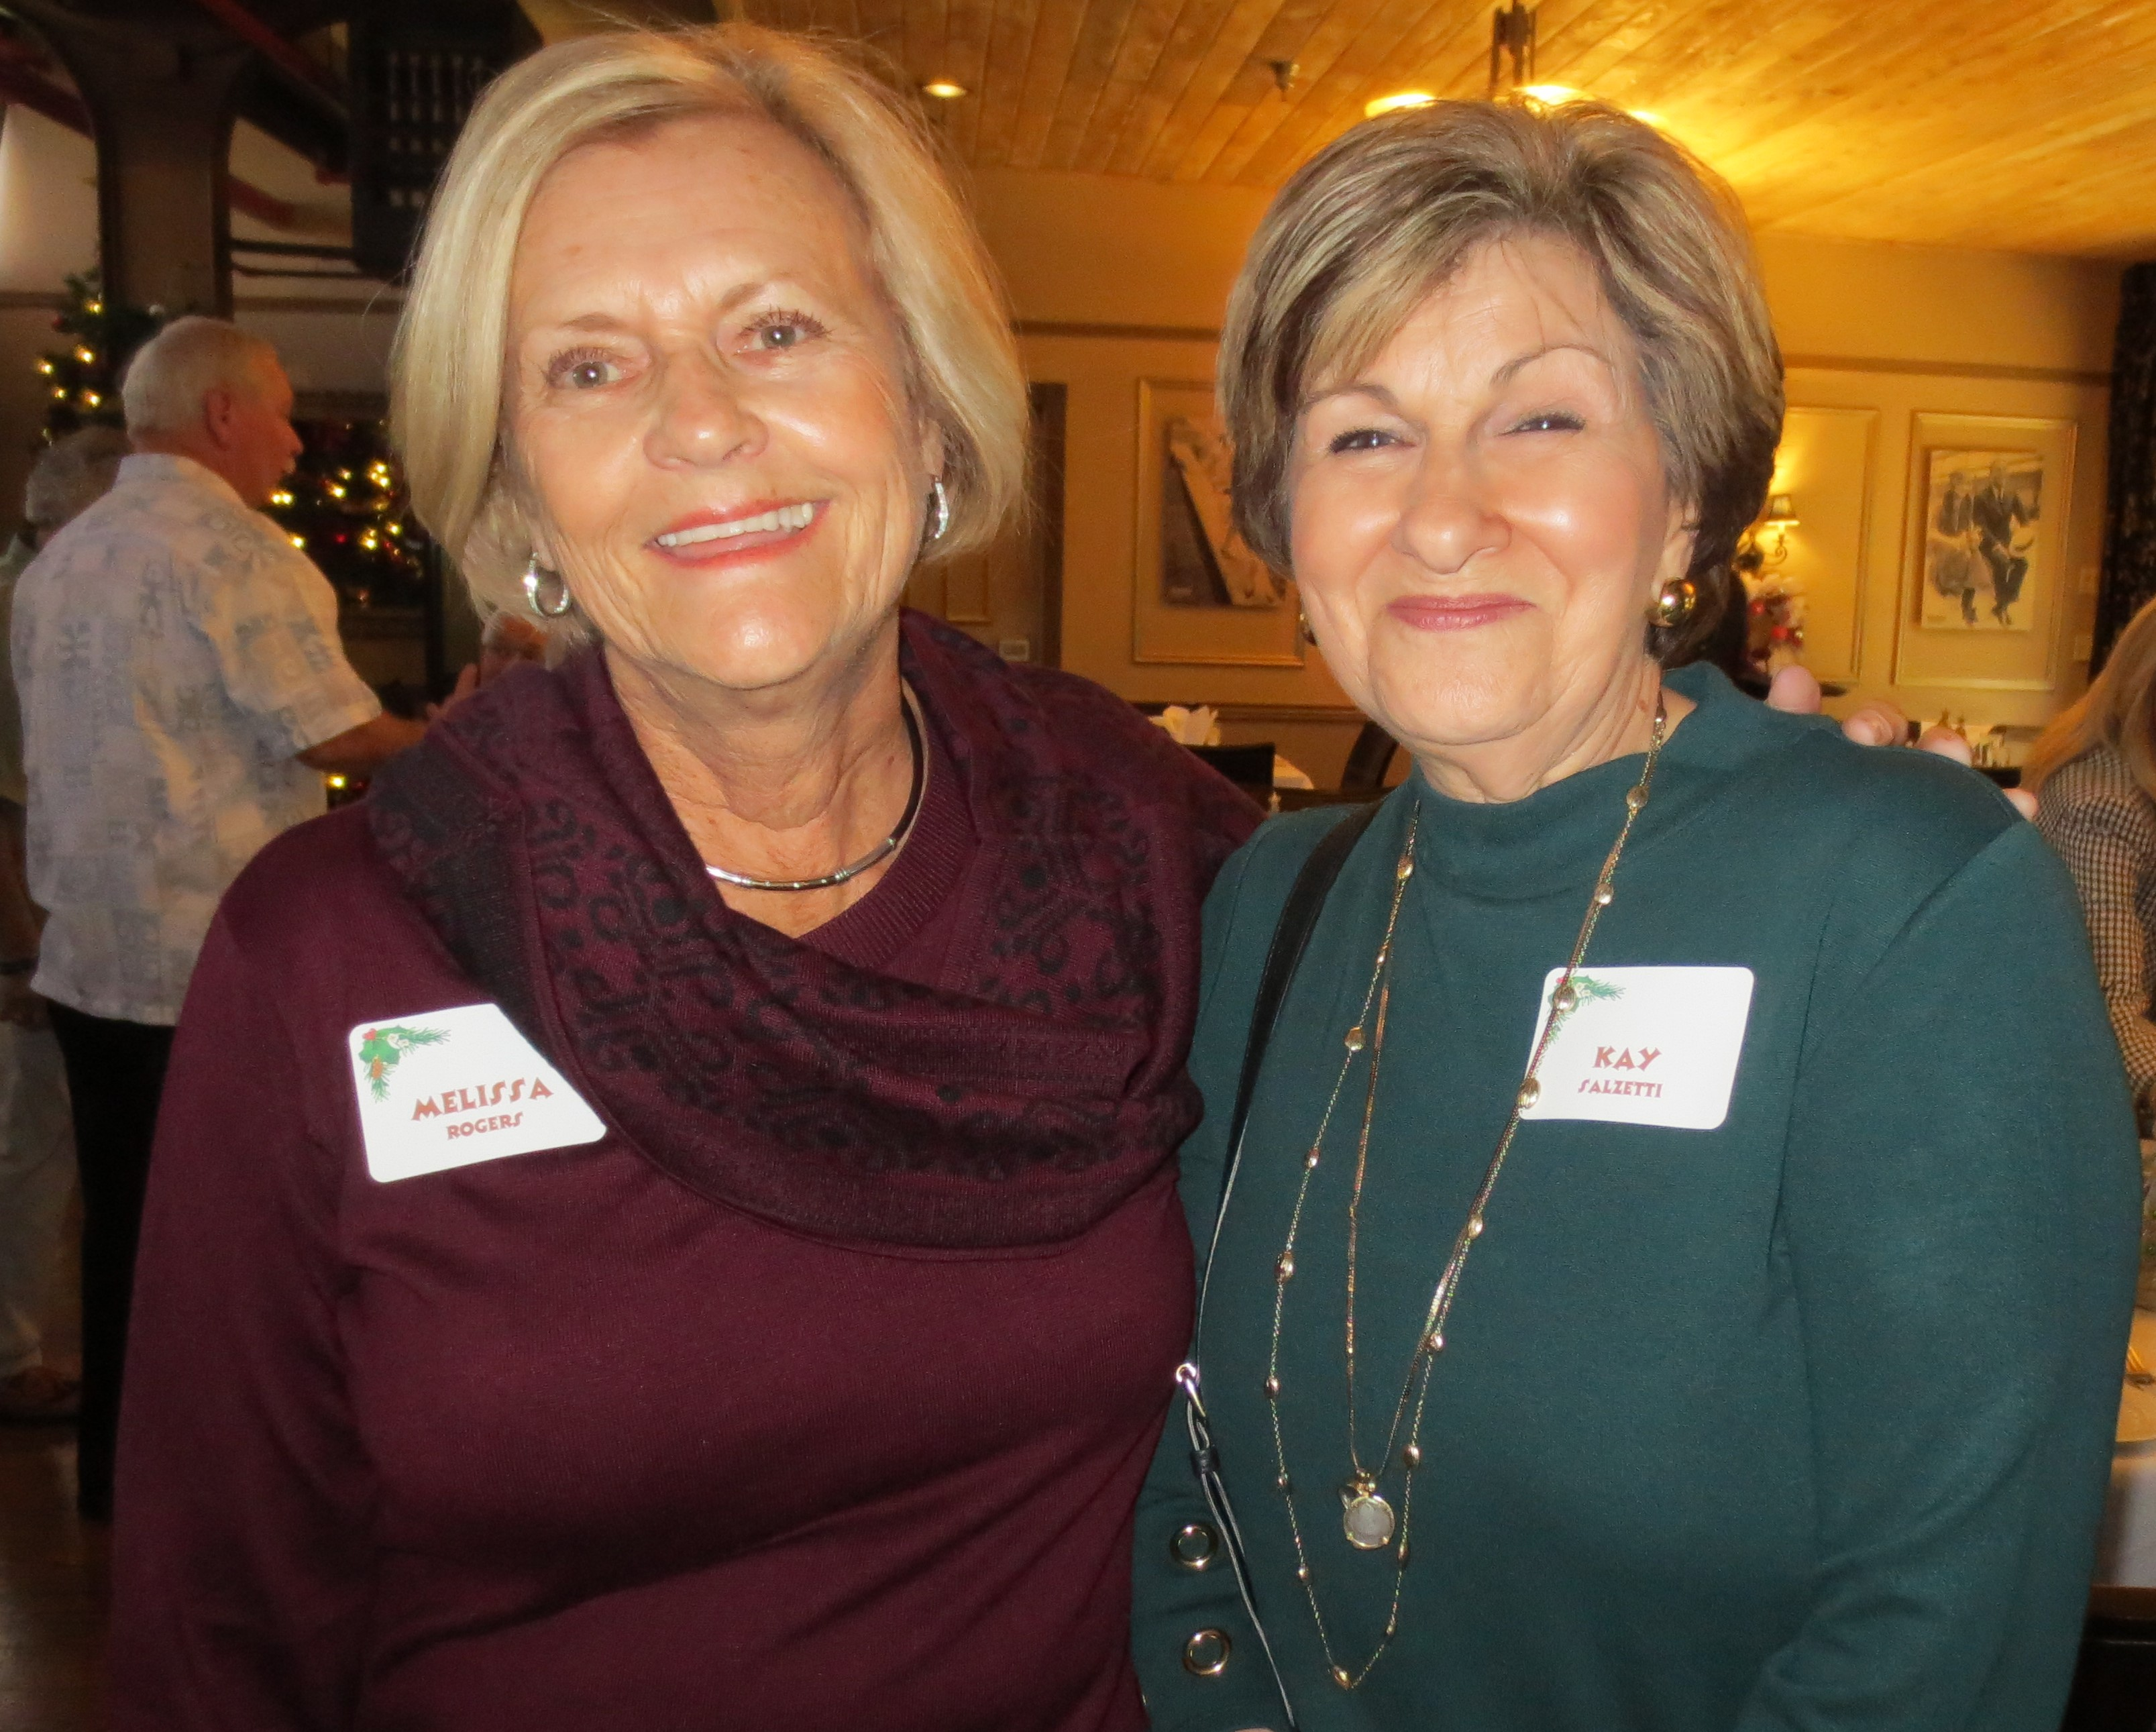 Melissa Rogers and Kay  Salzetti